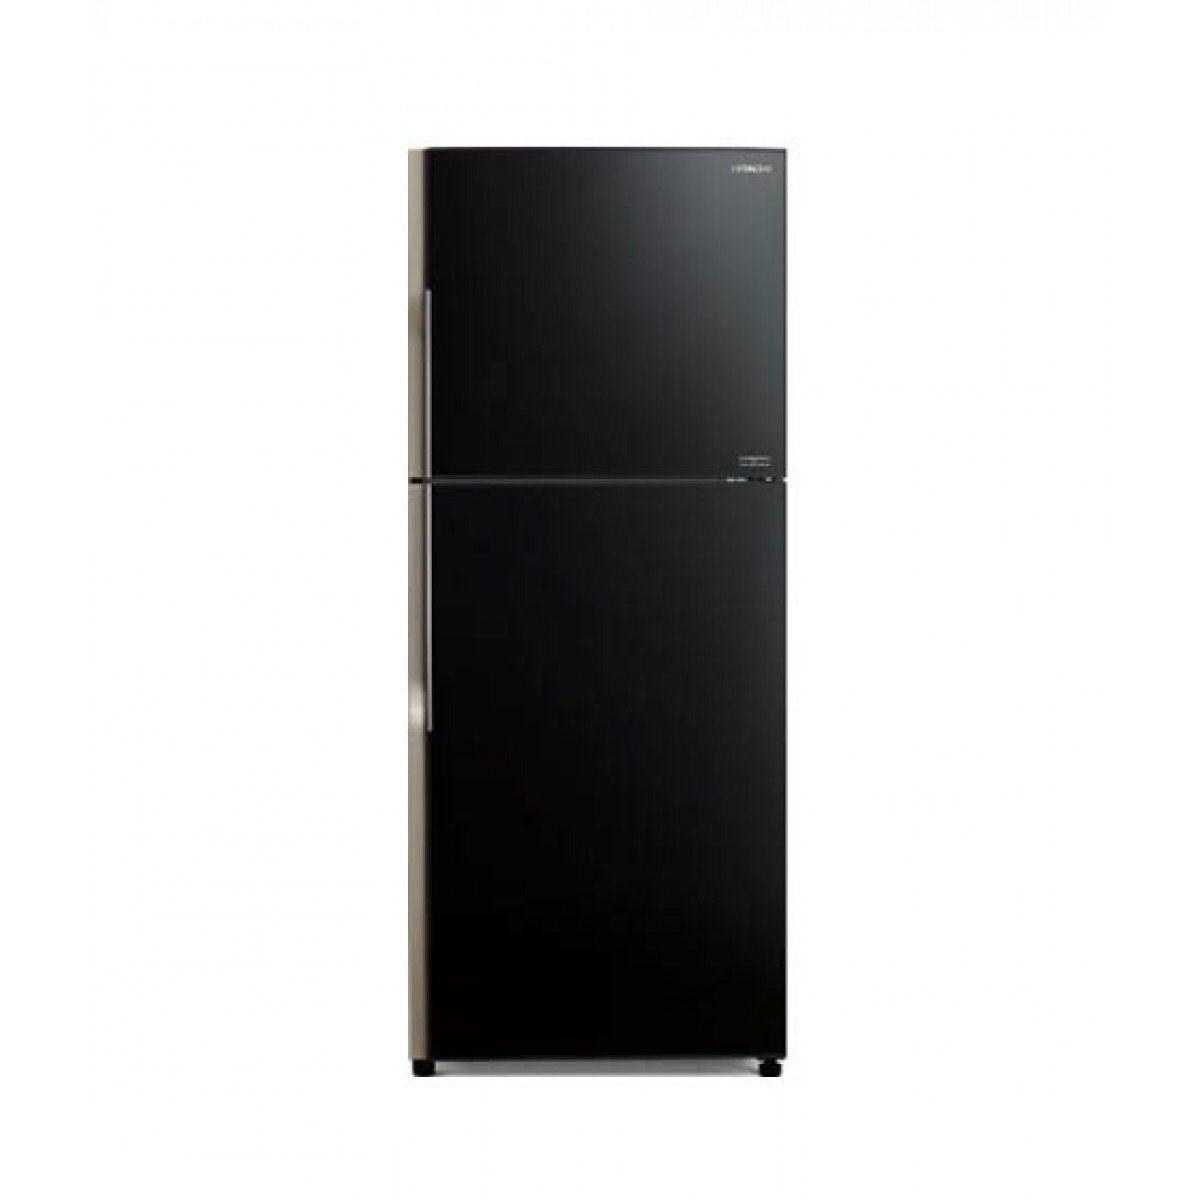 Hitachi RVG450P3MS Refrigerator